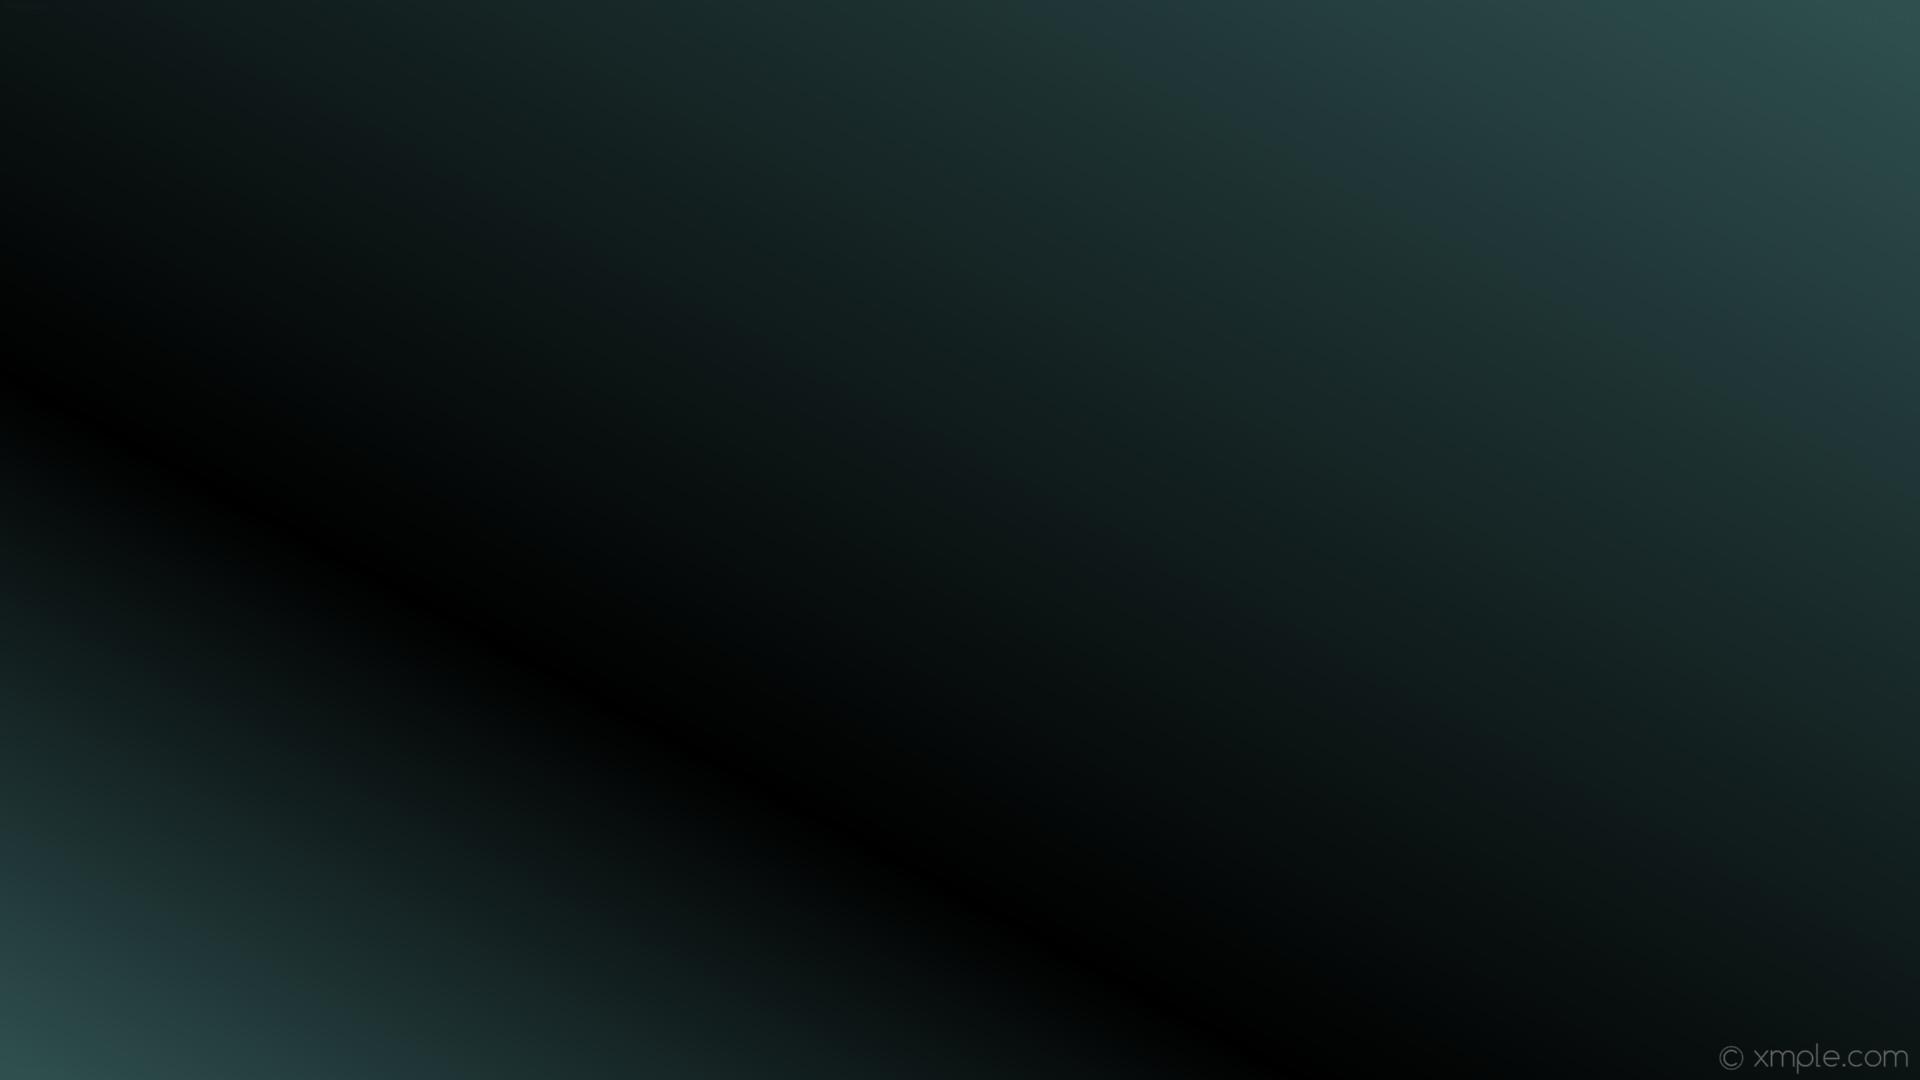 Wallpaper linear blue black gradient #6495ed #000000 270°